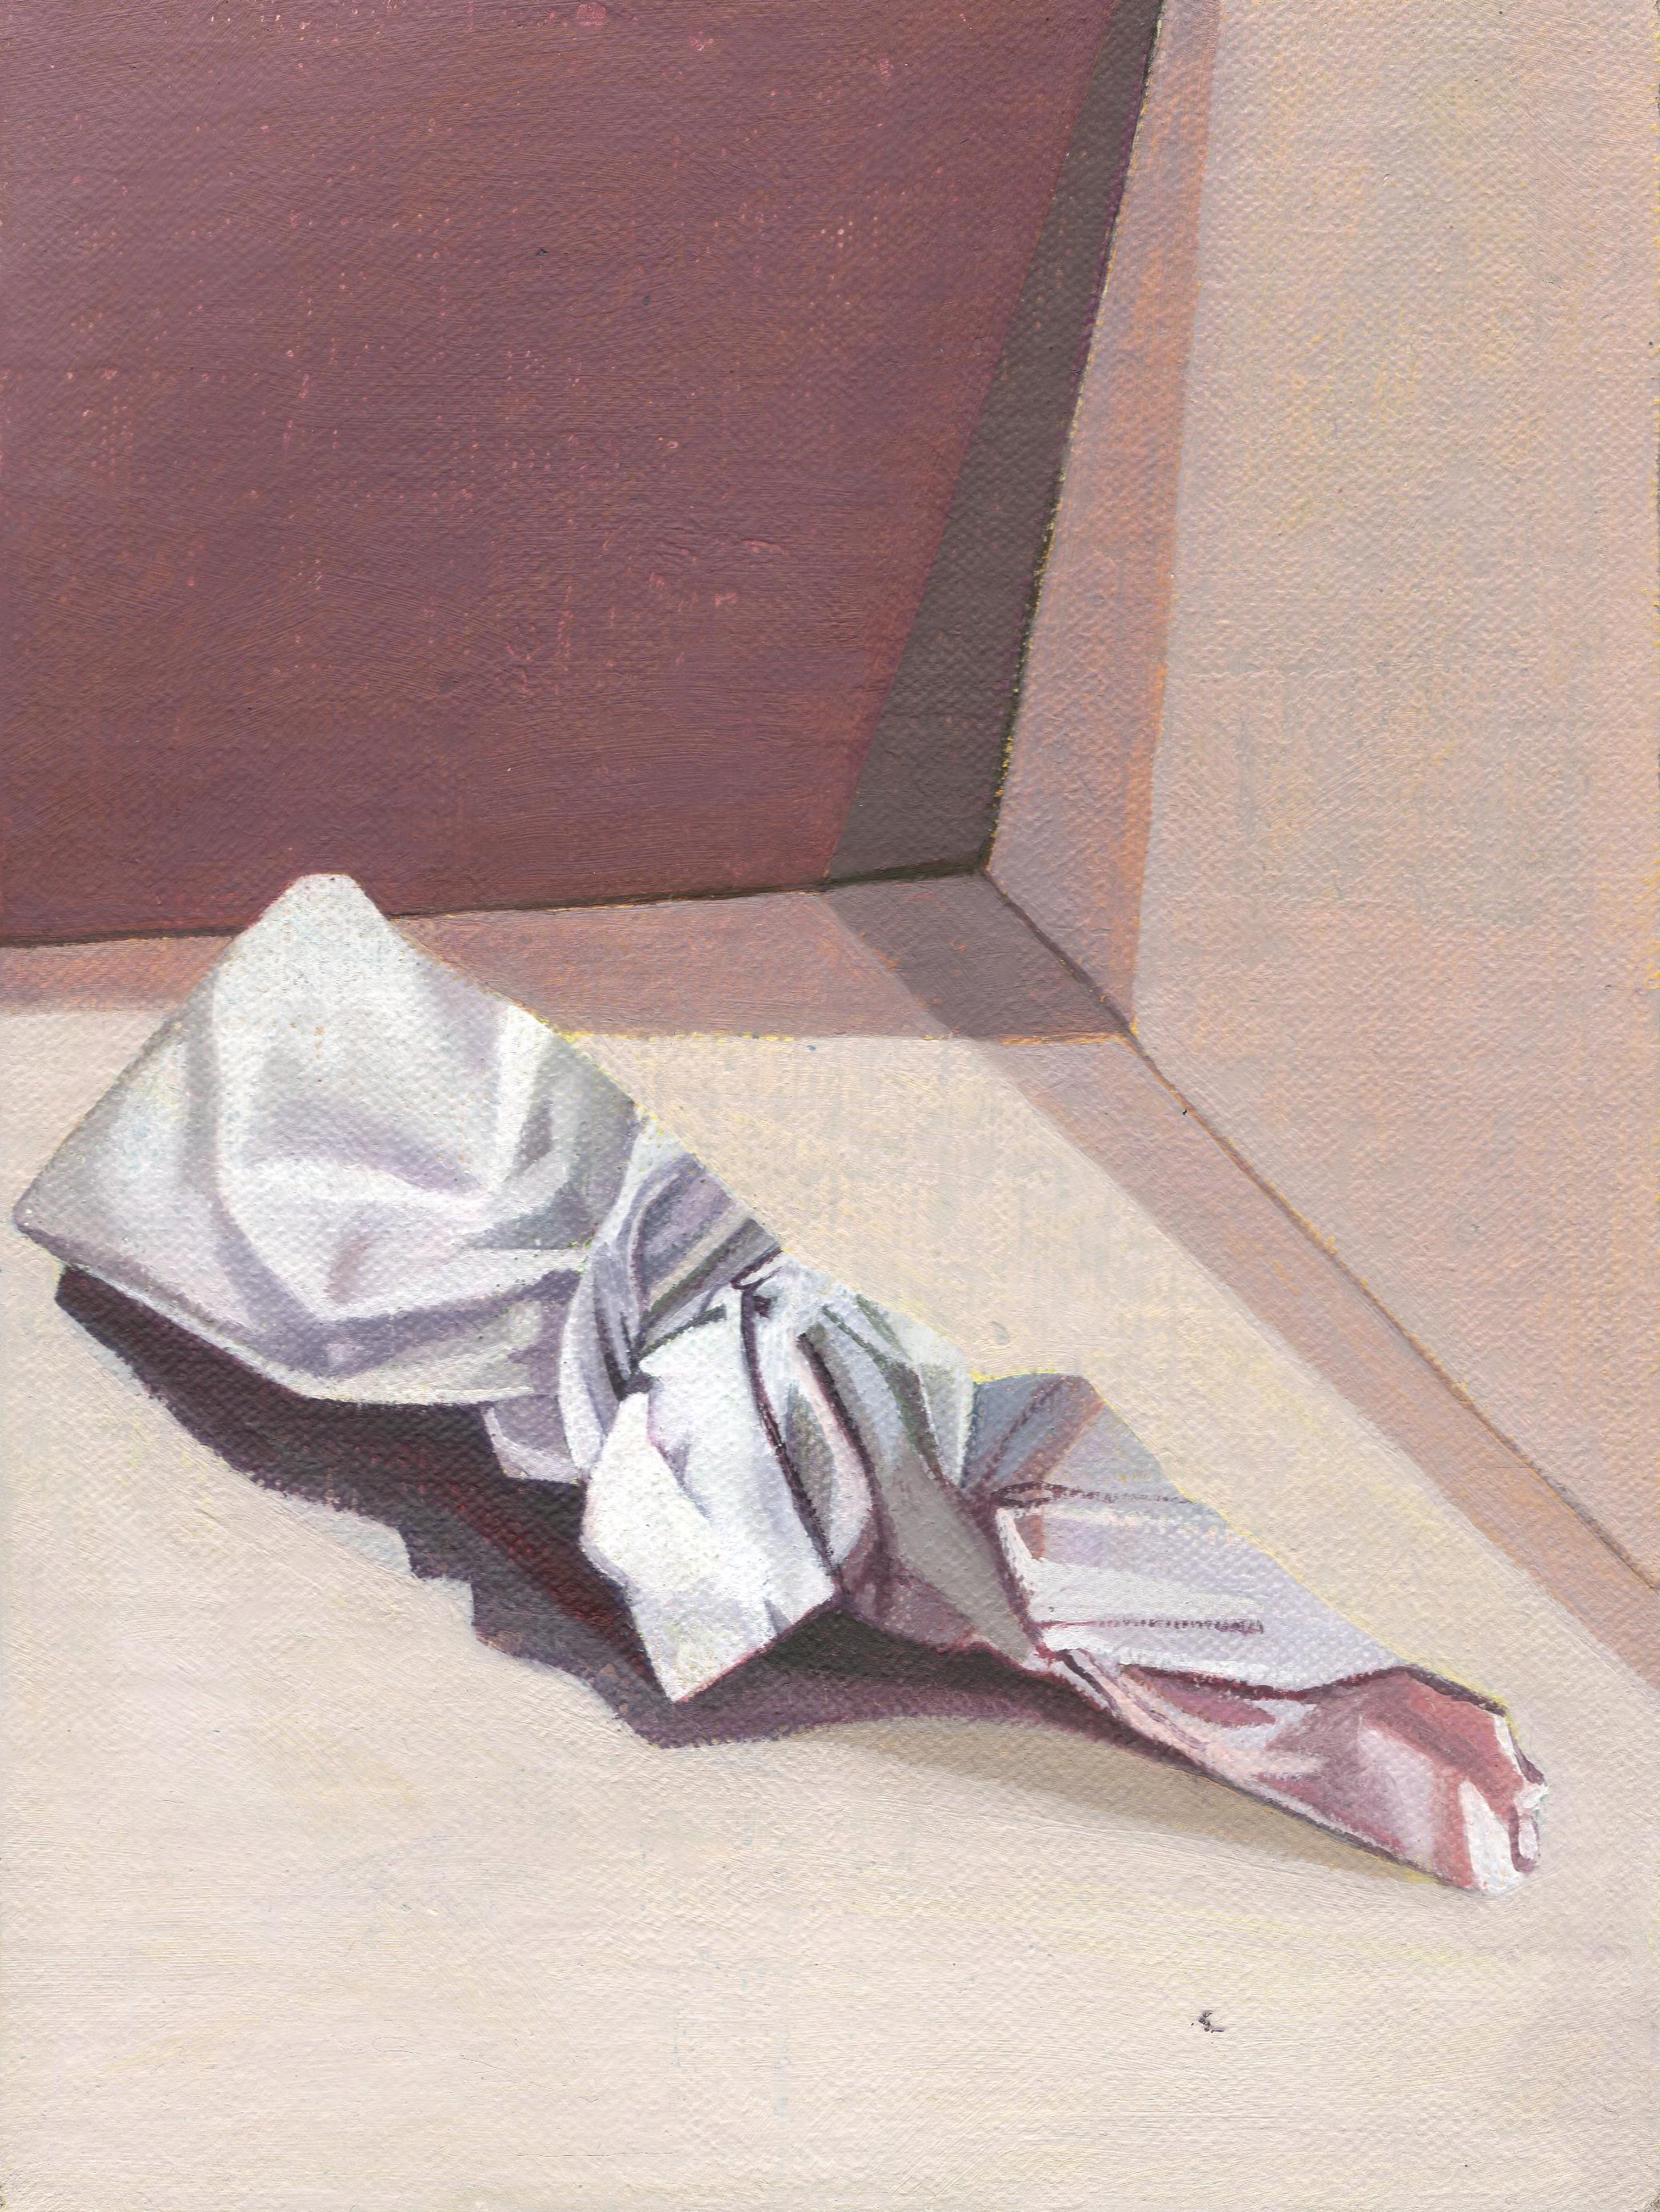 The Hospice (Purple), 2014  oil on linen, 8 x 6in.